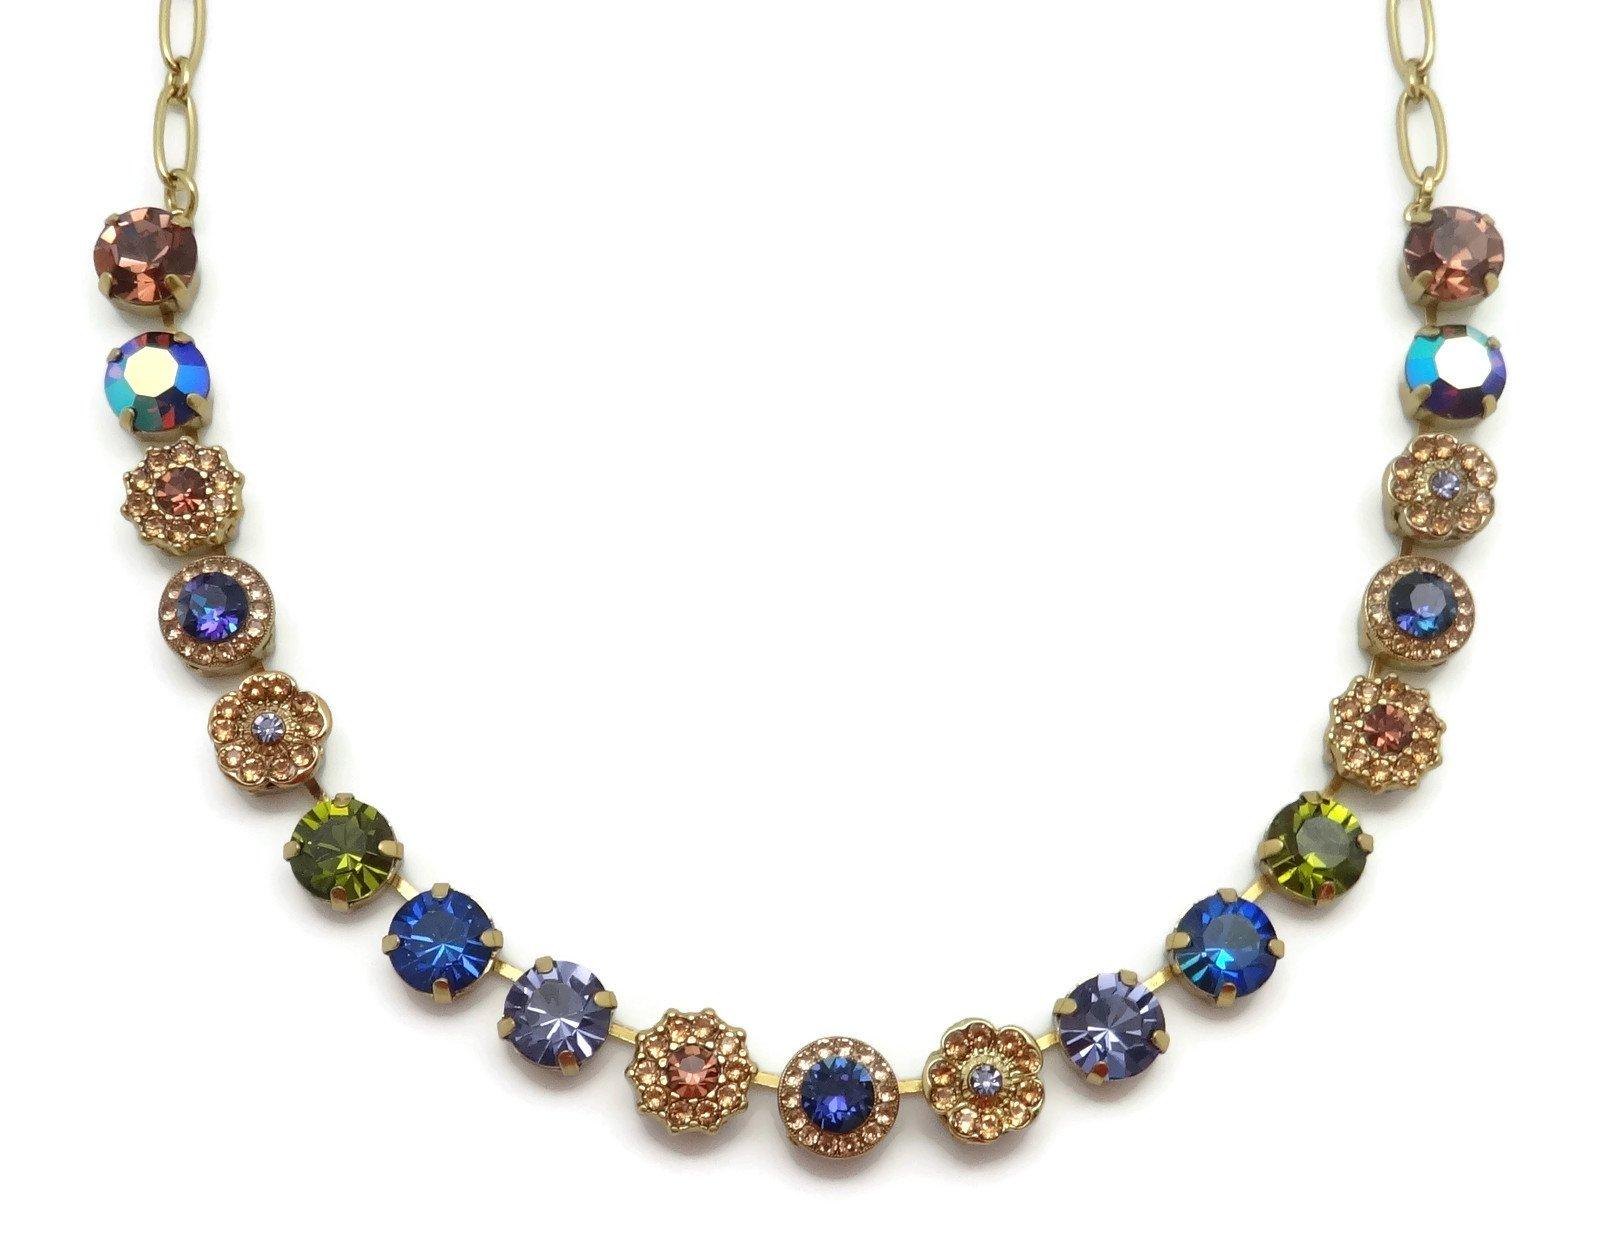 Mariana English Gold Plated Swarovski Crystal Necklace Multi Color Mosaic 1089 Odyssey Penelope by Mariana (Image #1)